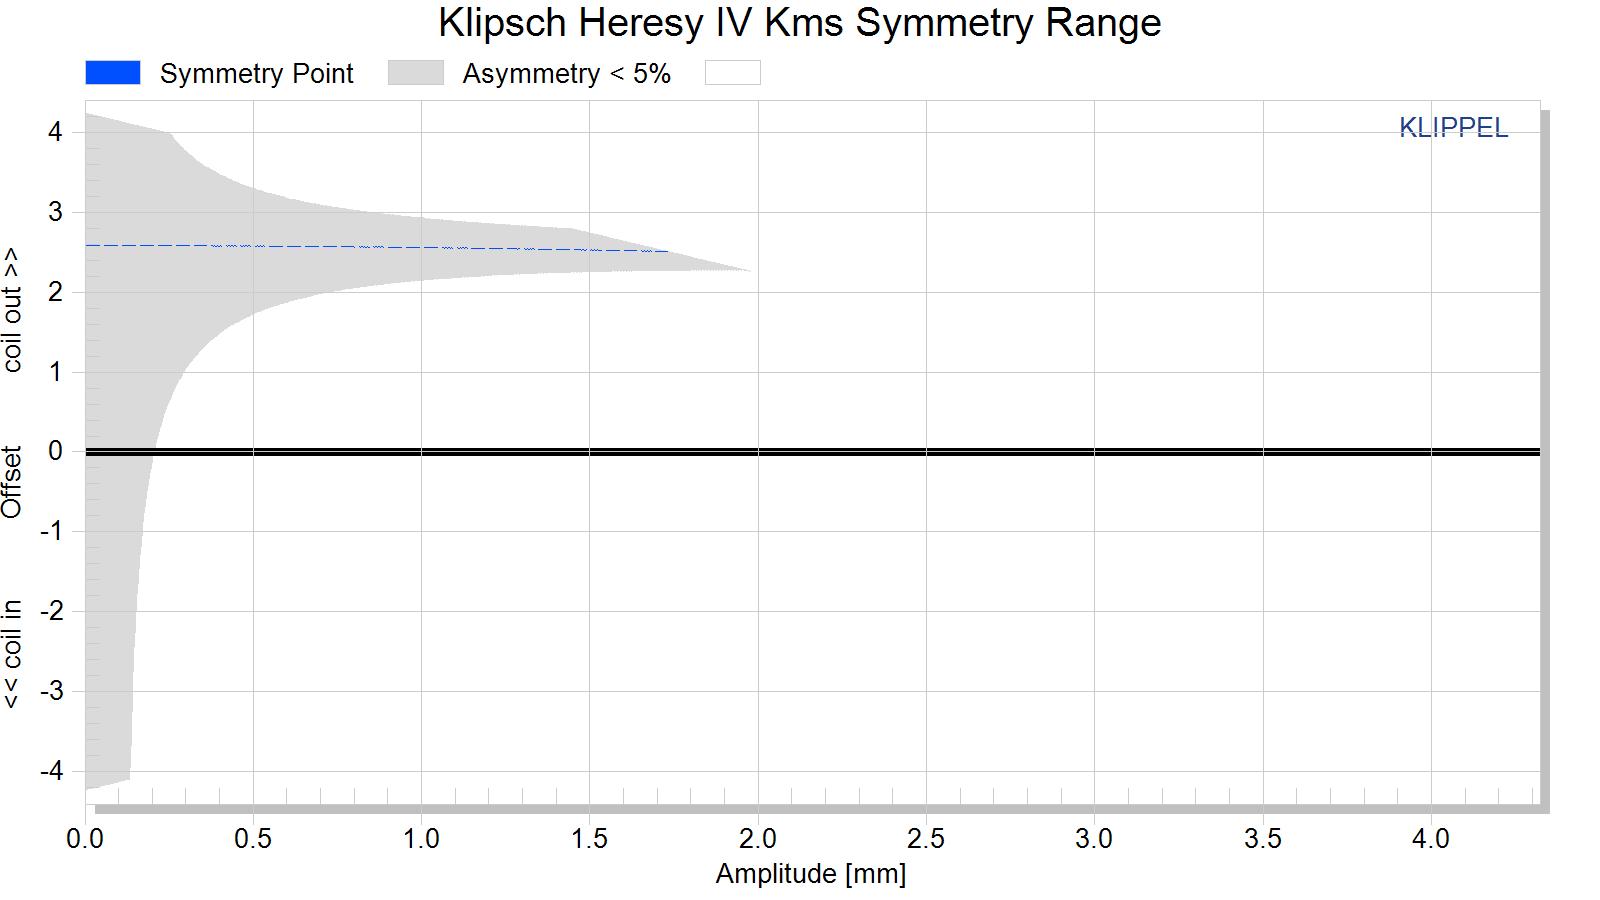 Klipsch Heresy IV Kms Symmetry Range.png